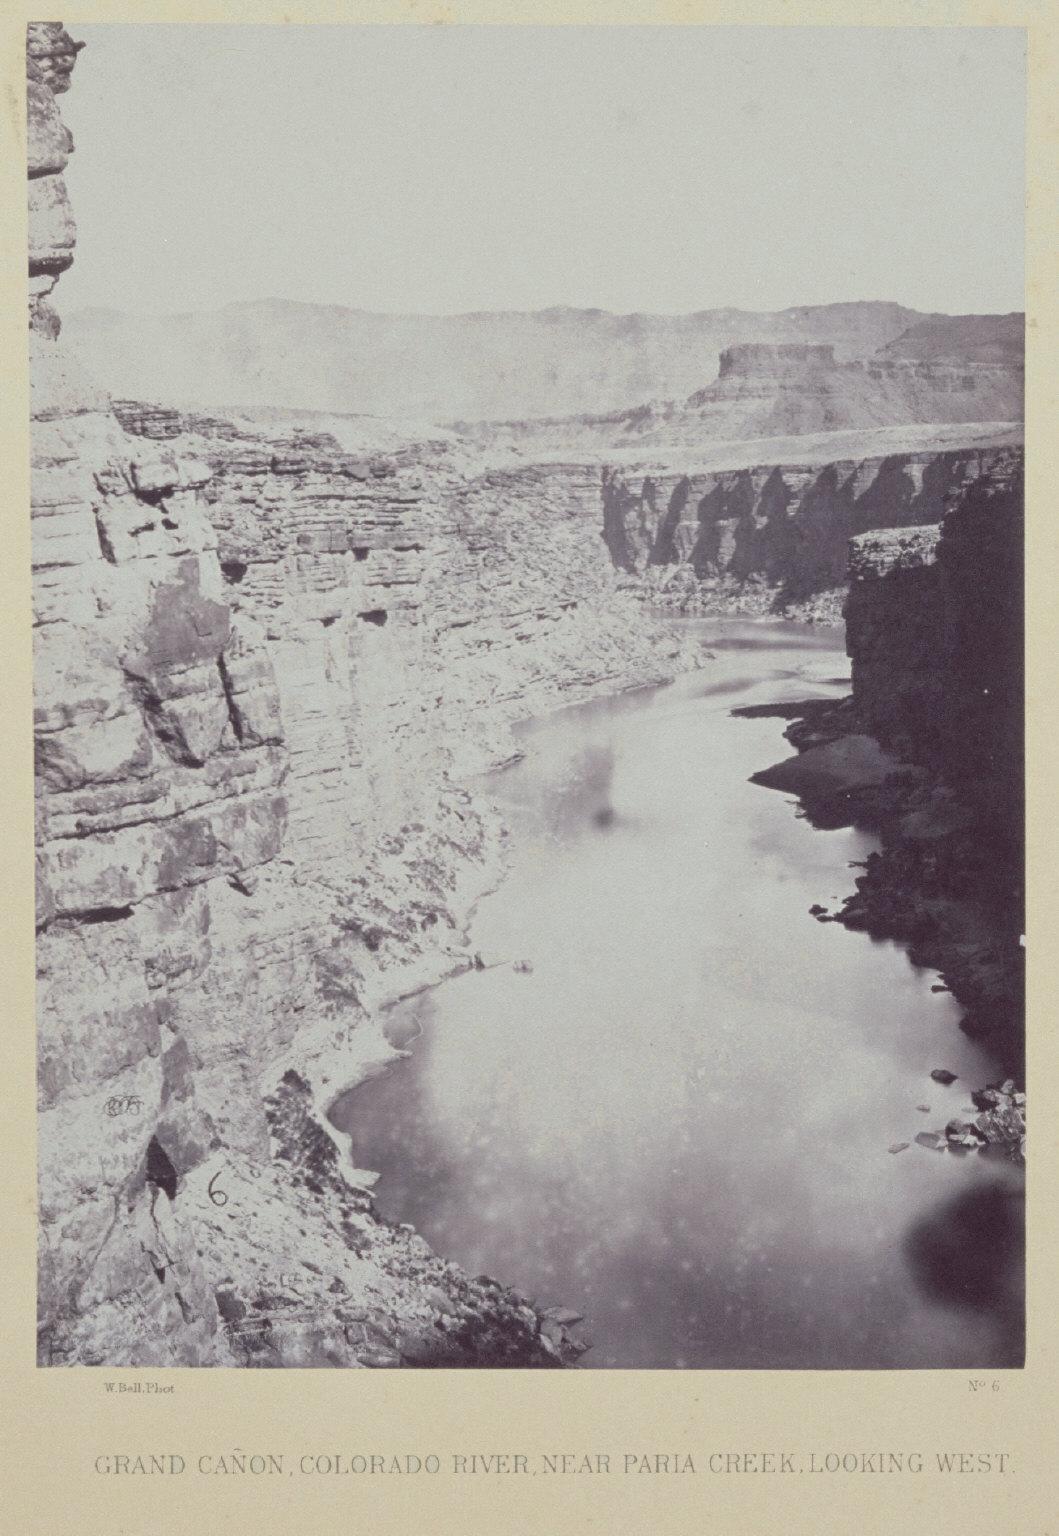 Grand Canon, Colorado River, Near Paria Creek, Looking West.